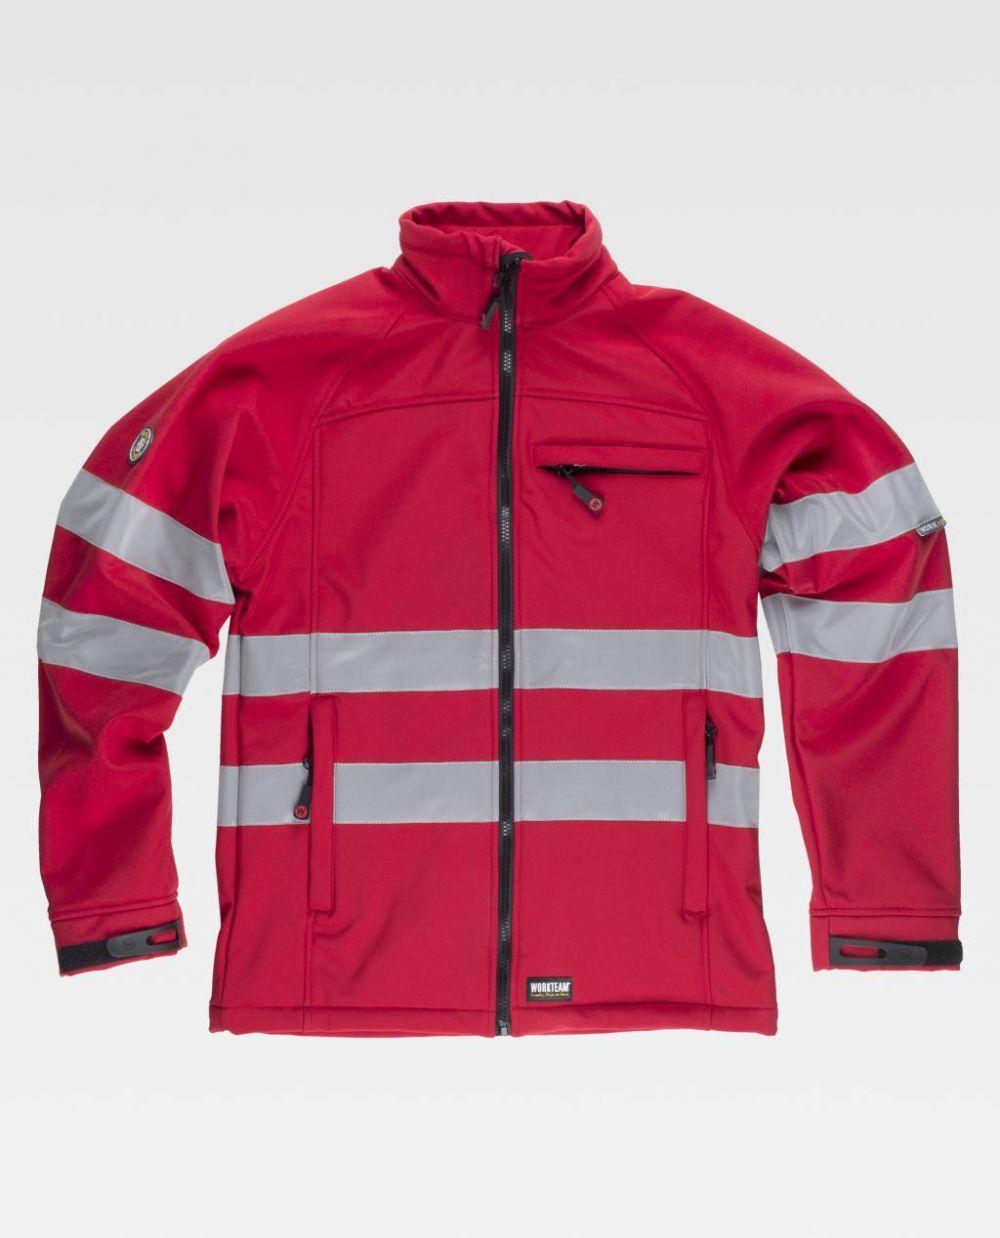 Chaquetas reflectantes workteam chaquetas workshell de algodon con impresión vista 1